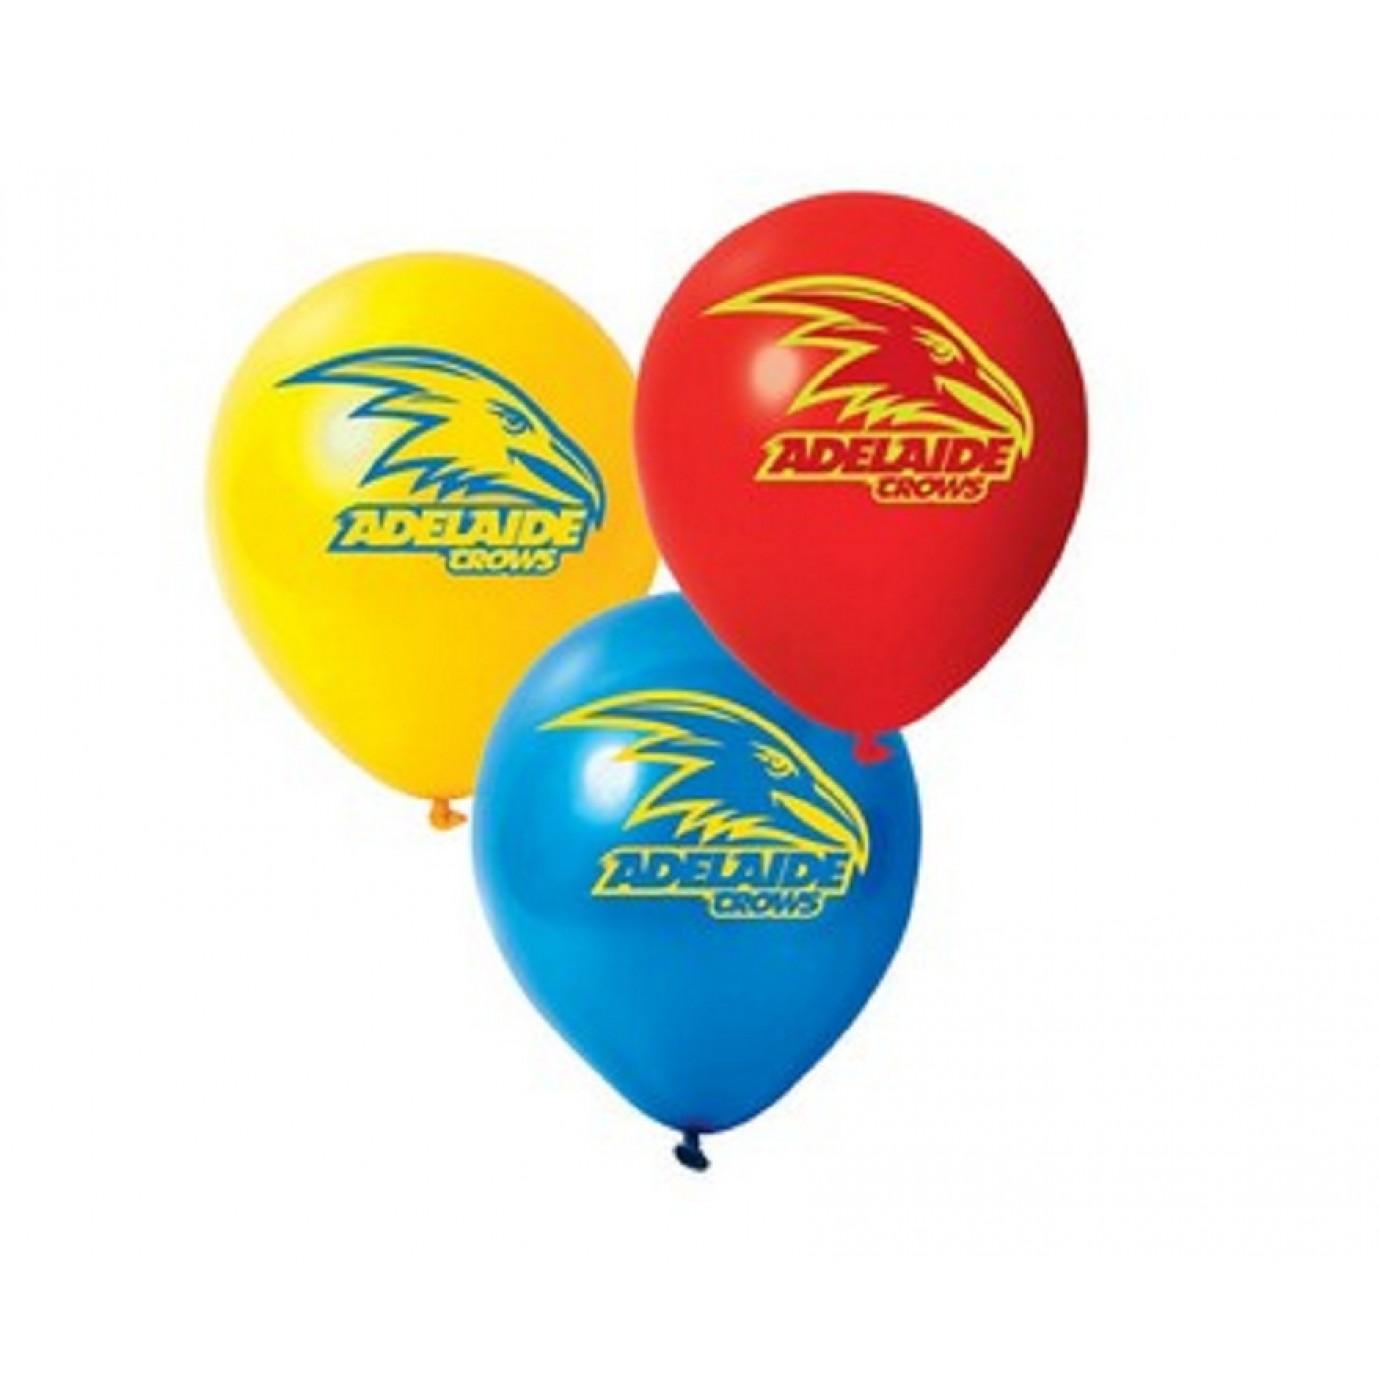 AFL Party Supplies AFL Decorations Aussie Rules Party Supplies